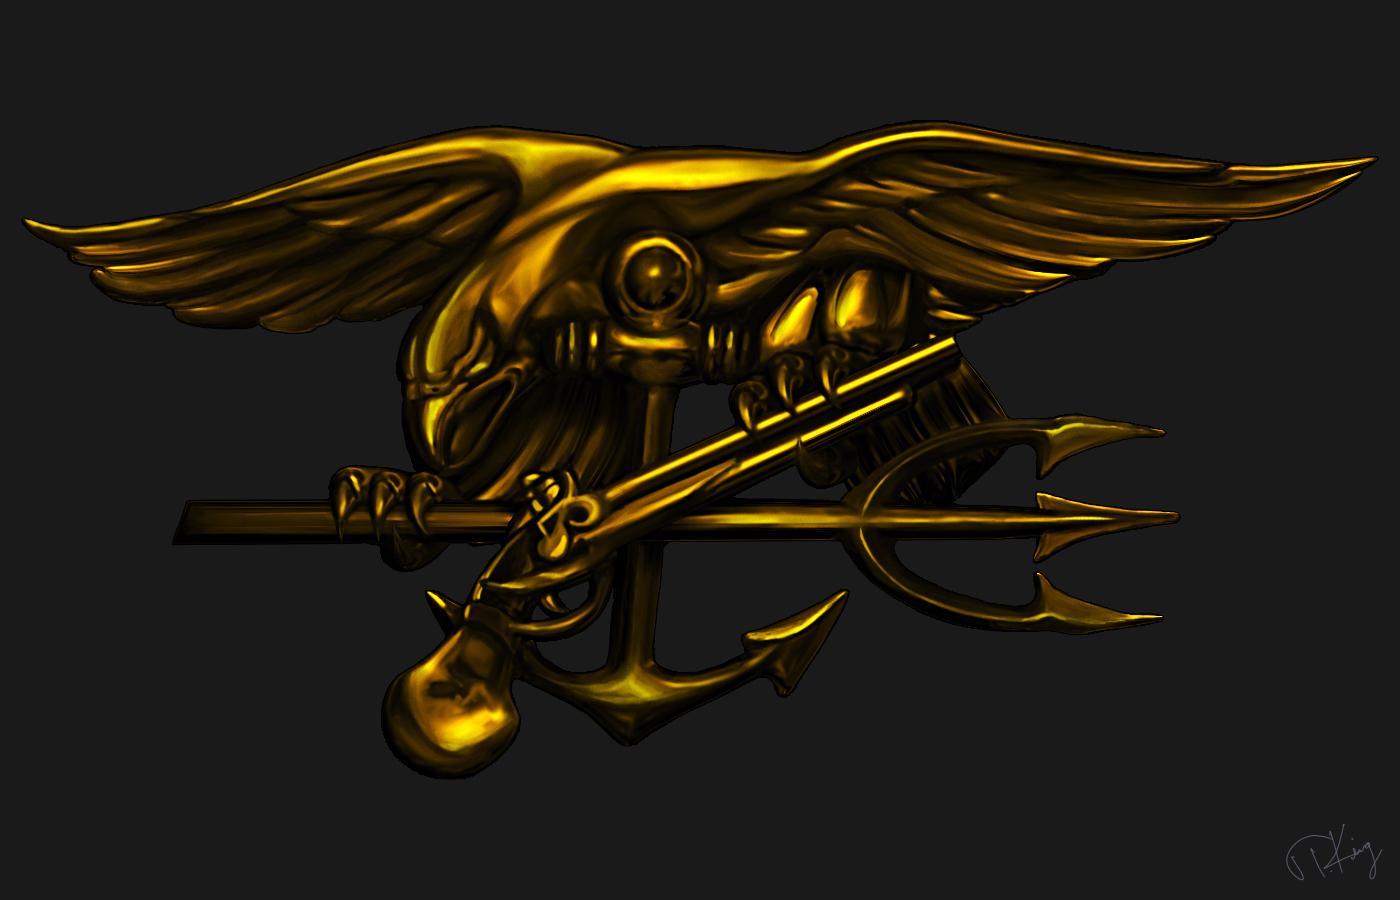 Navy Seal Trident Wallpaper 1400x900